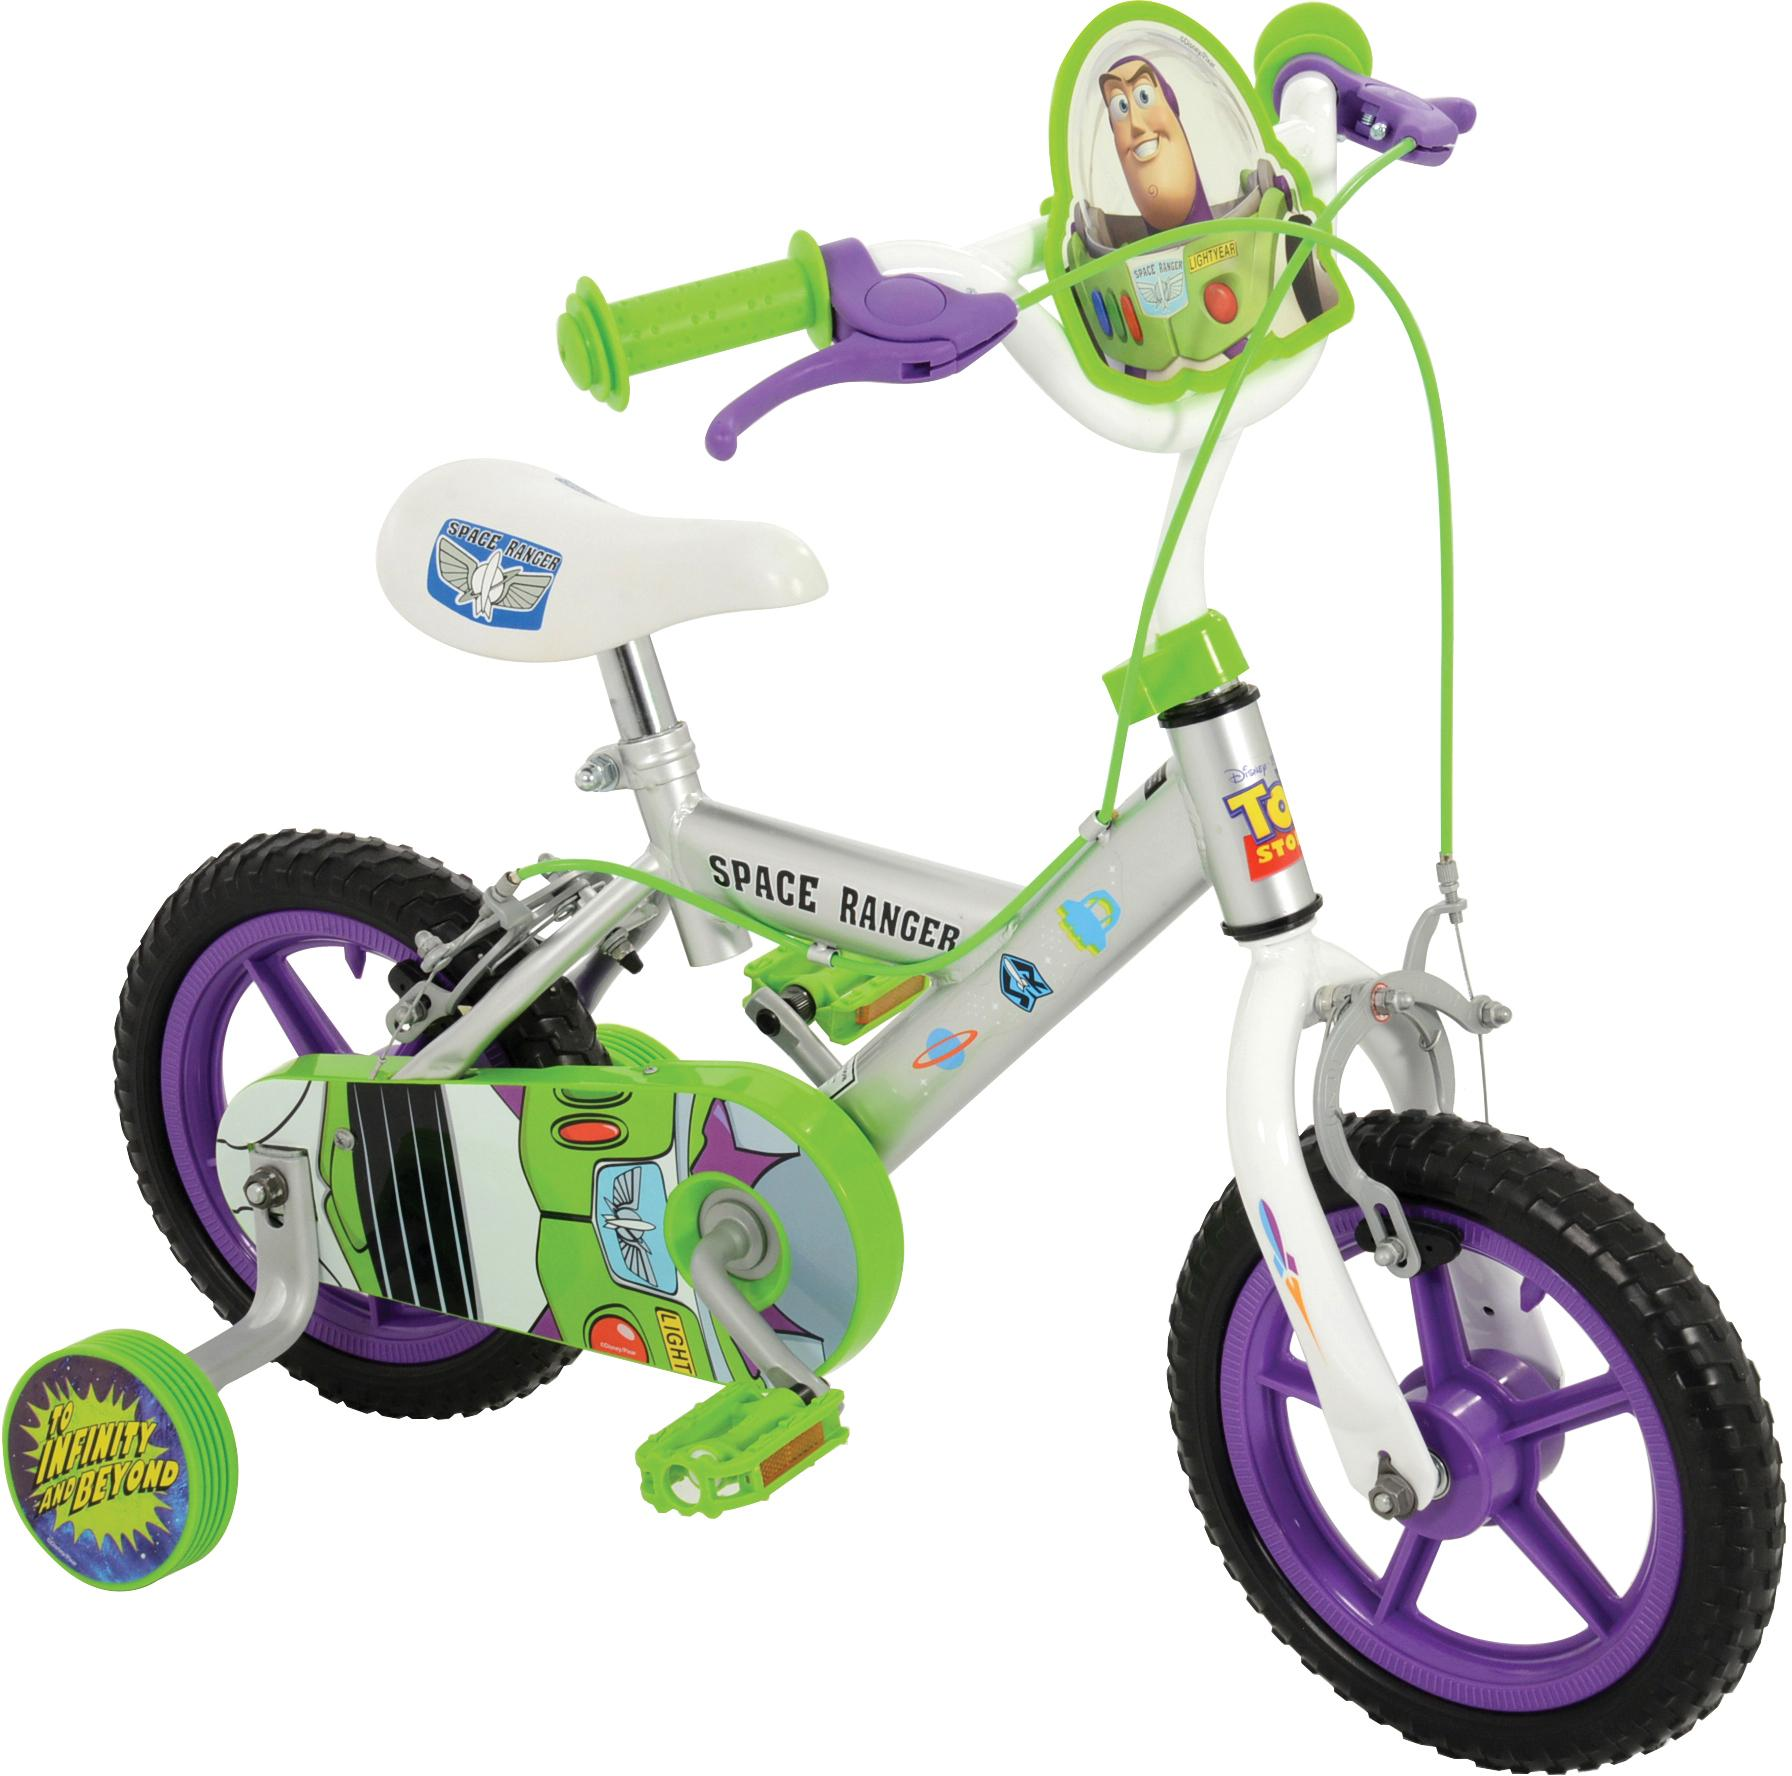 Buzz Lightyear Kids Bike   12 Inch Wheel